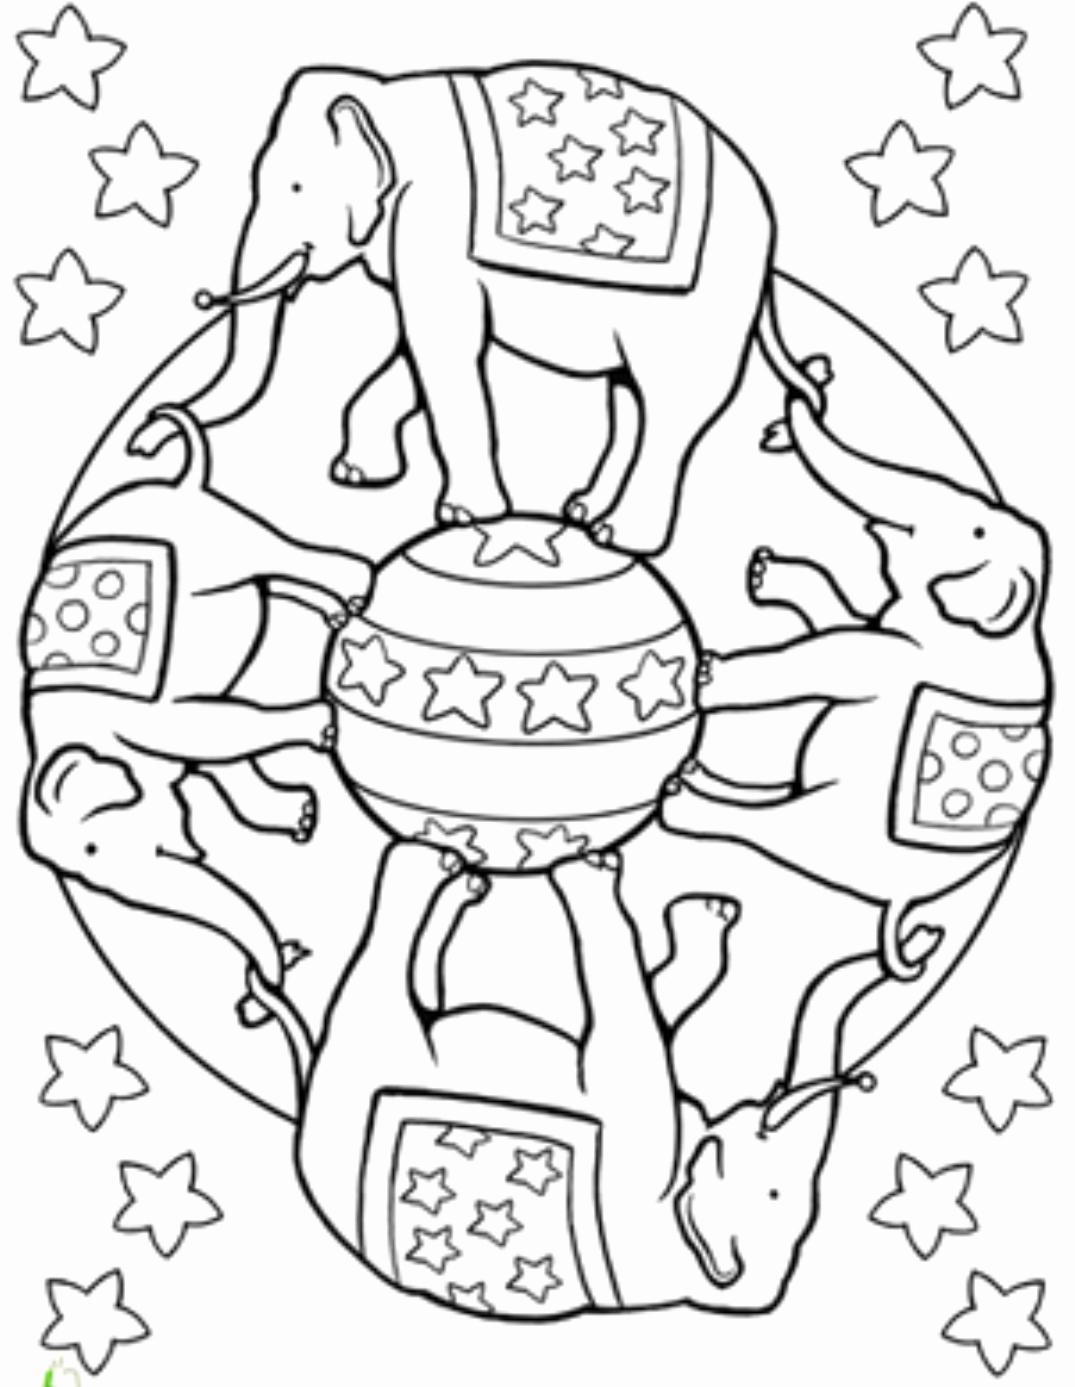 Elephant Mandala Coloring Pages Elegant Free Coloring Pages Mandala Elephant 747 Bestofcoloring